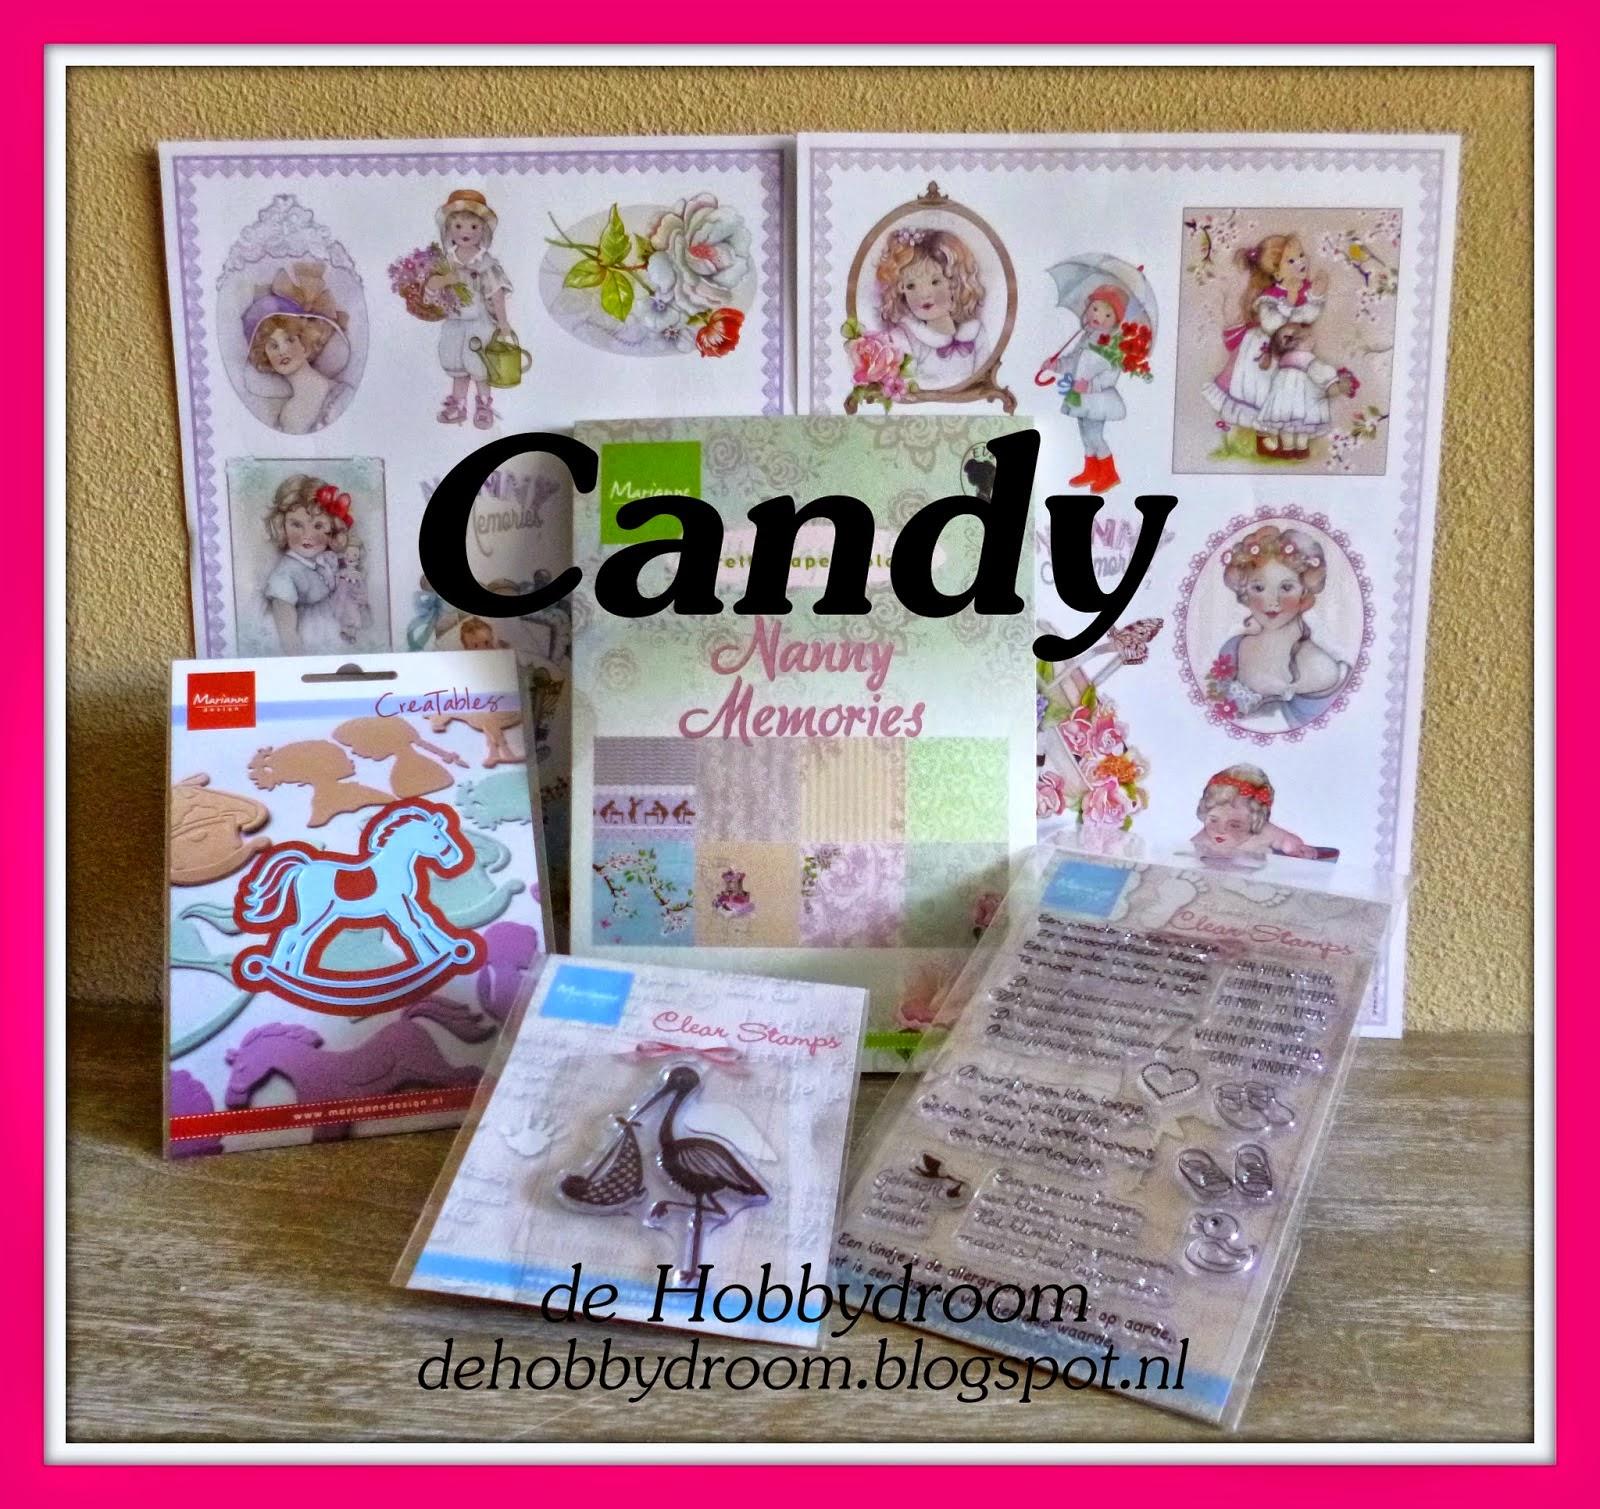 Candy HobbyDRoom tot 10 april